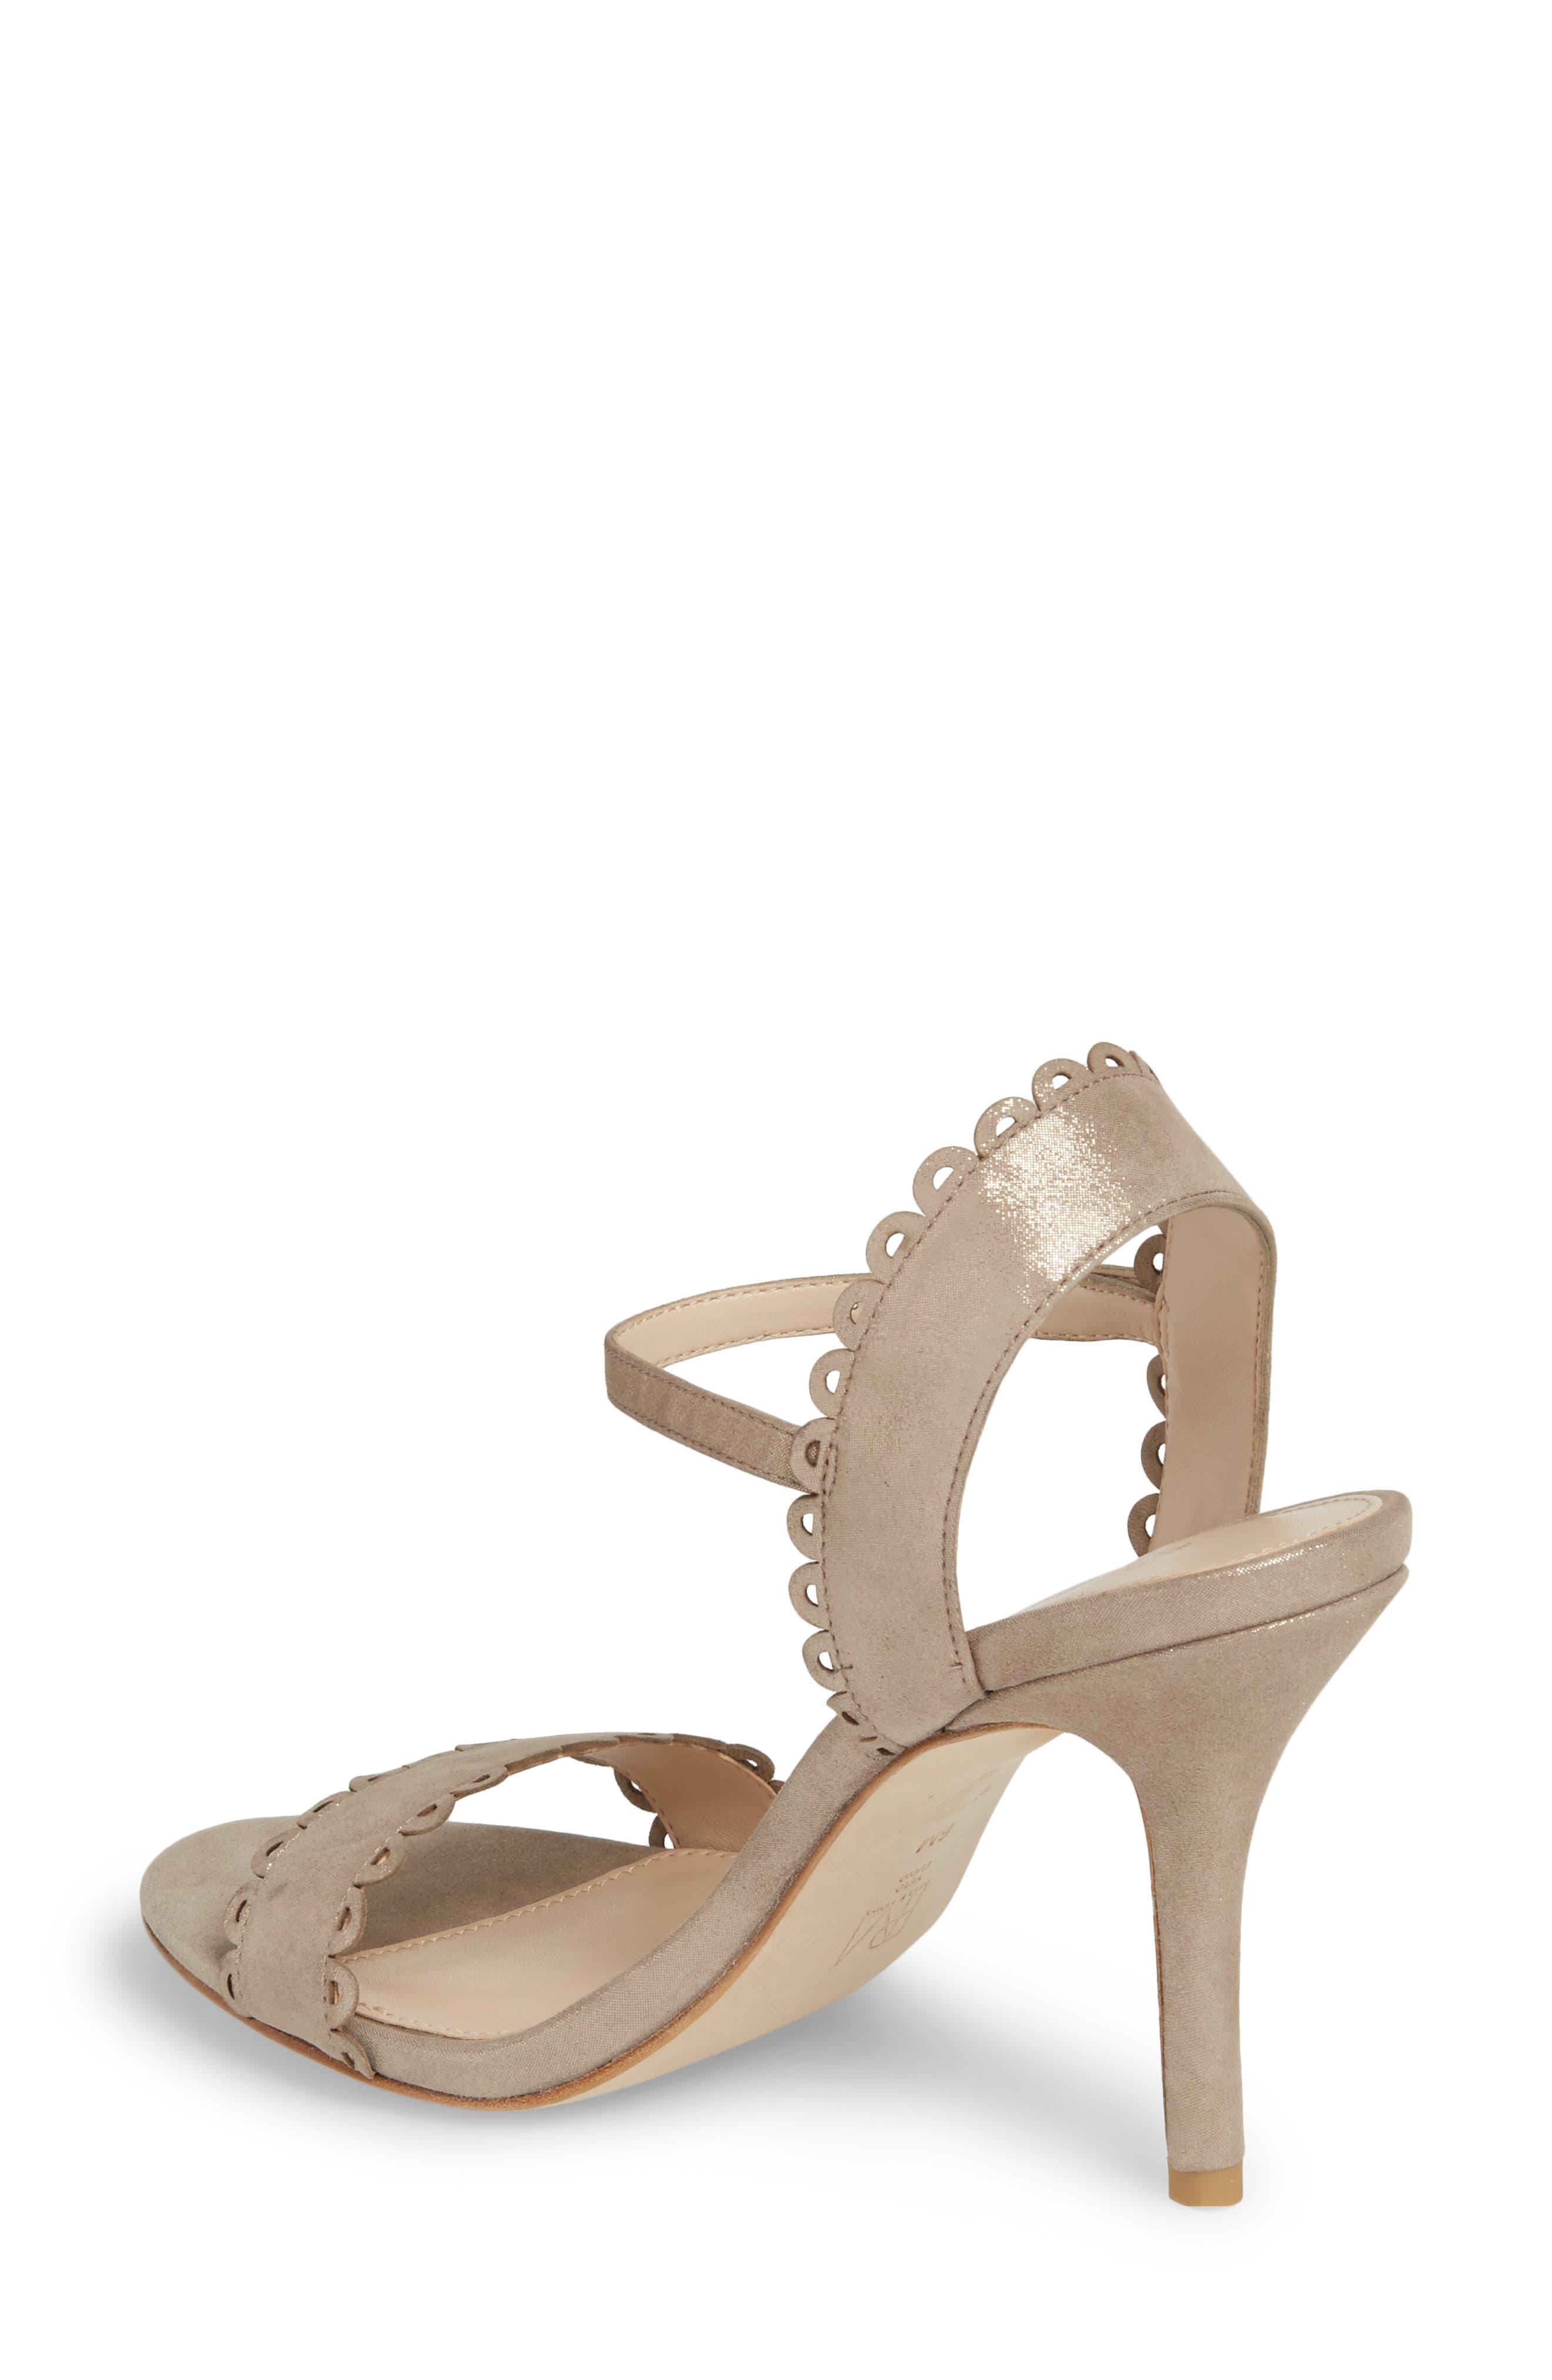 Karen Scallop Ankle Strap Sandal,                             Alternate thumbnail 5, color,